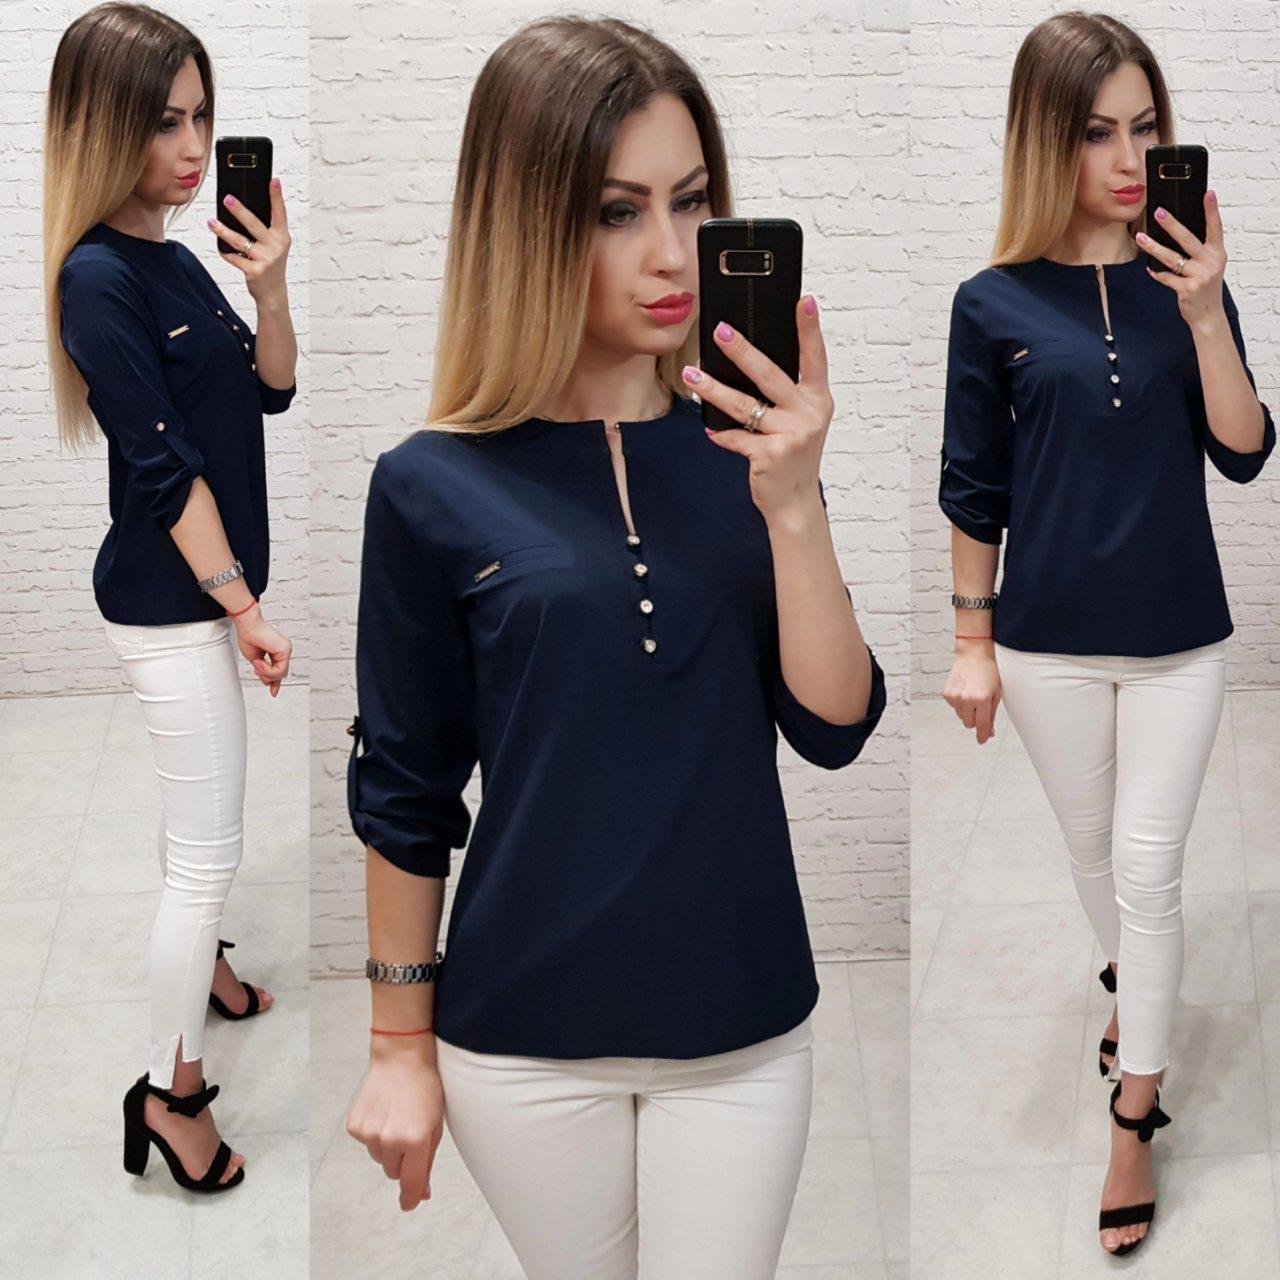 Блуза / блузка арт. 830 тёмно синего цвета  /  цвет синий тёмный